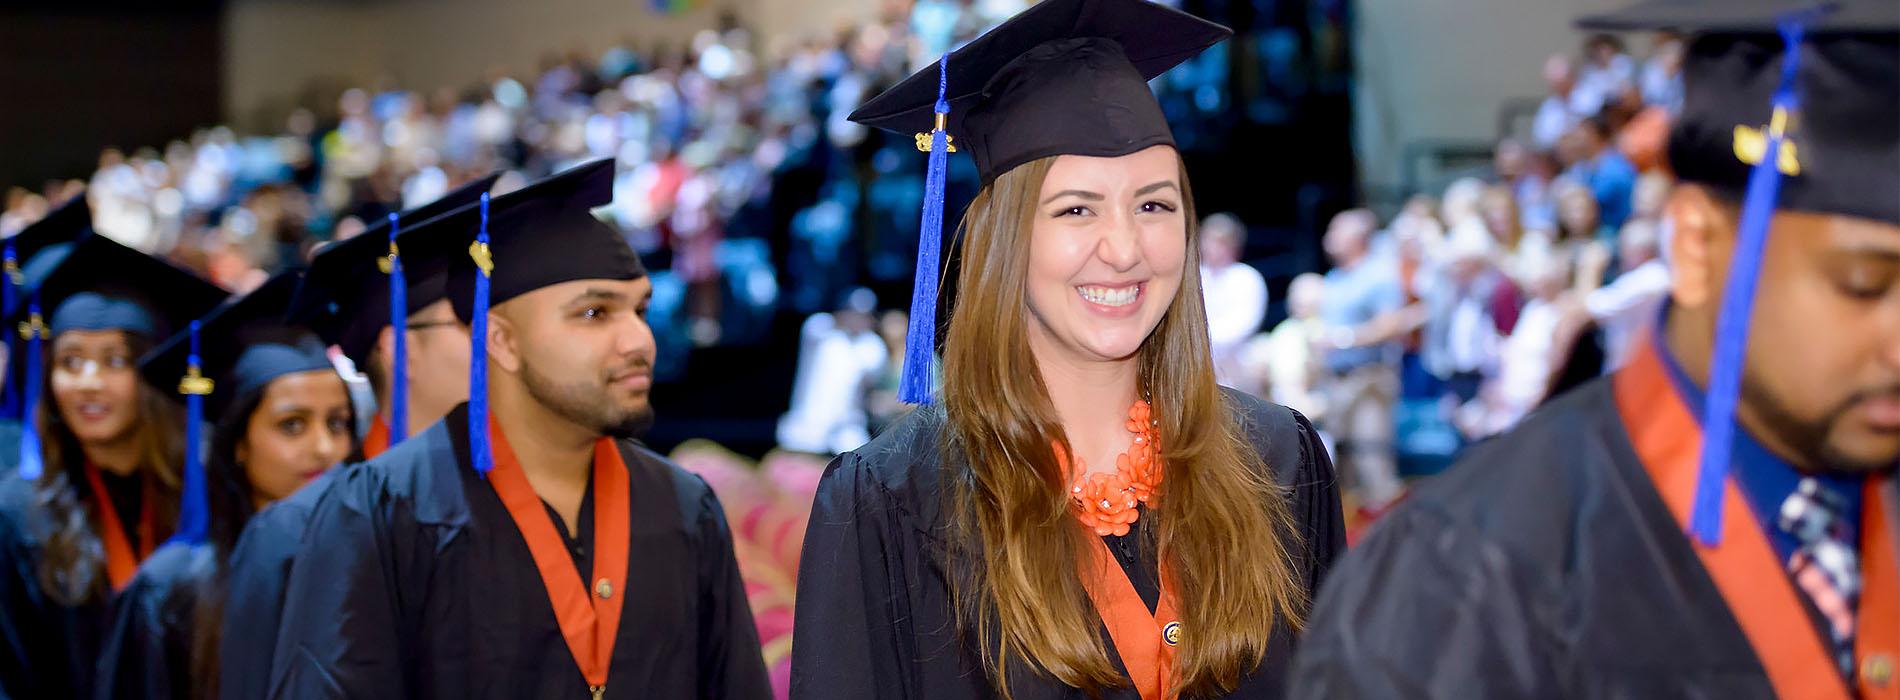 UTMB graduation ceremony